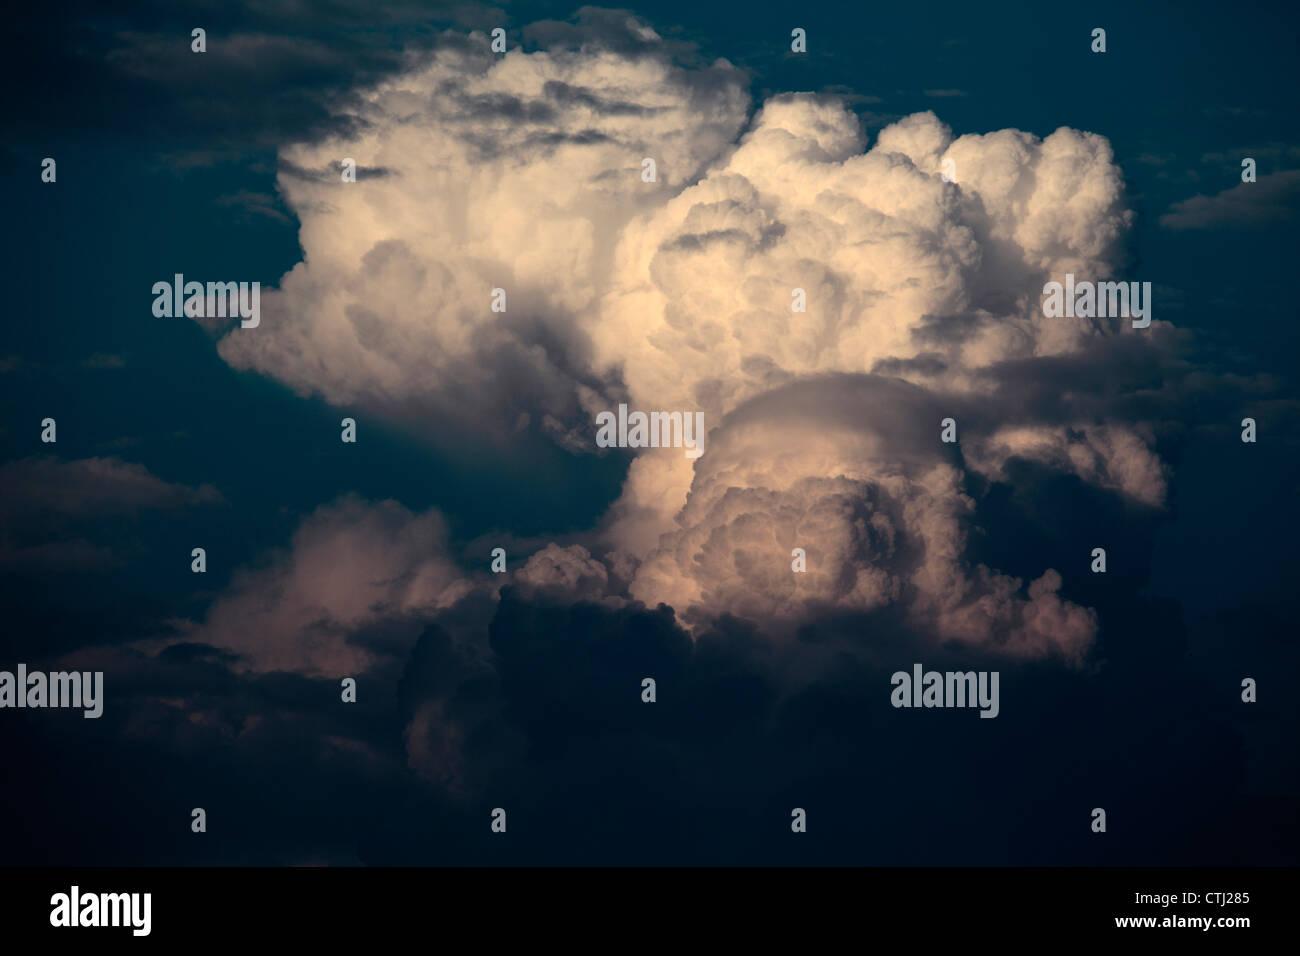 Cumulonimbus cloud at sunset. - Stock Image